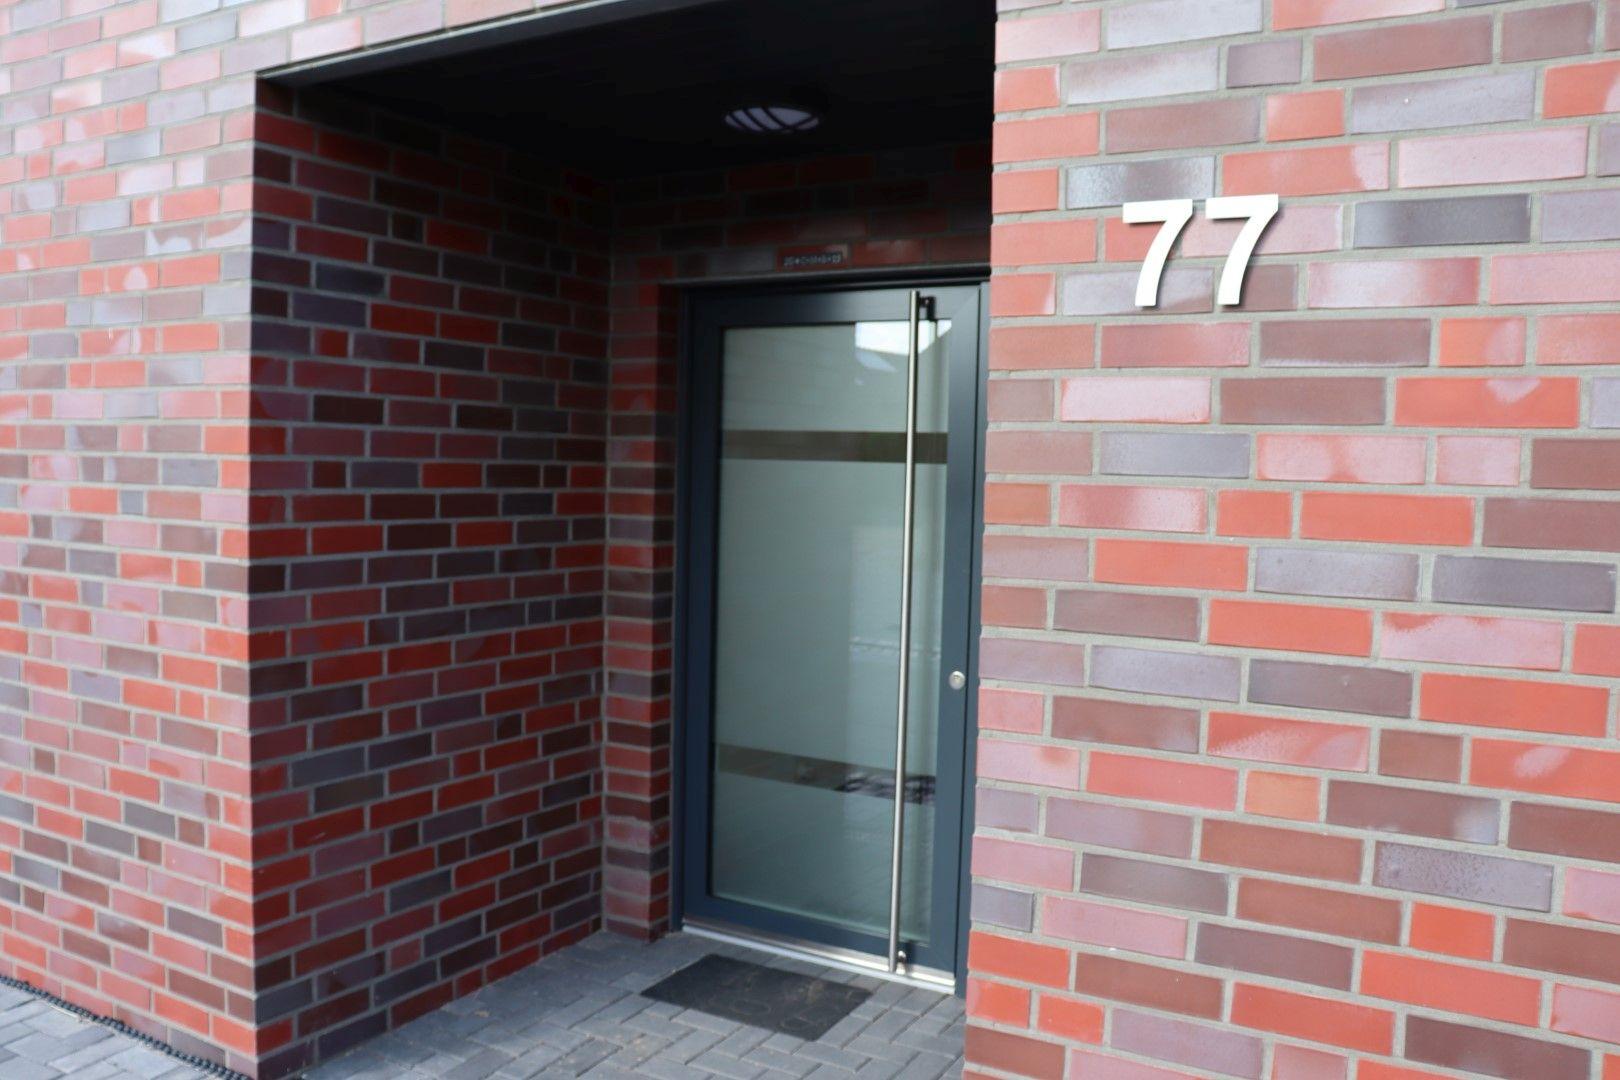 Immobilie Nr.0266 | Kaiserswerther Str. 77, 47809 Krefeld - Stratum